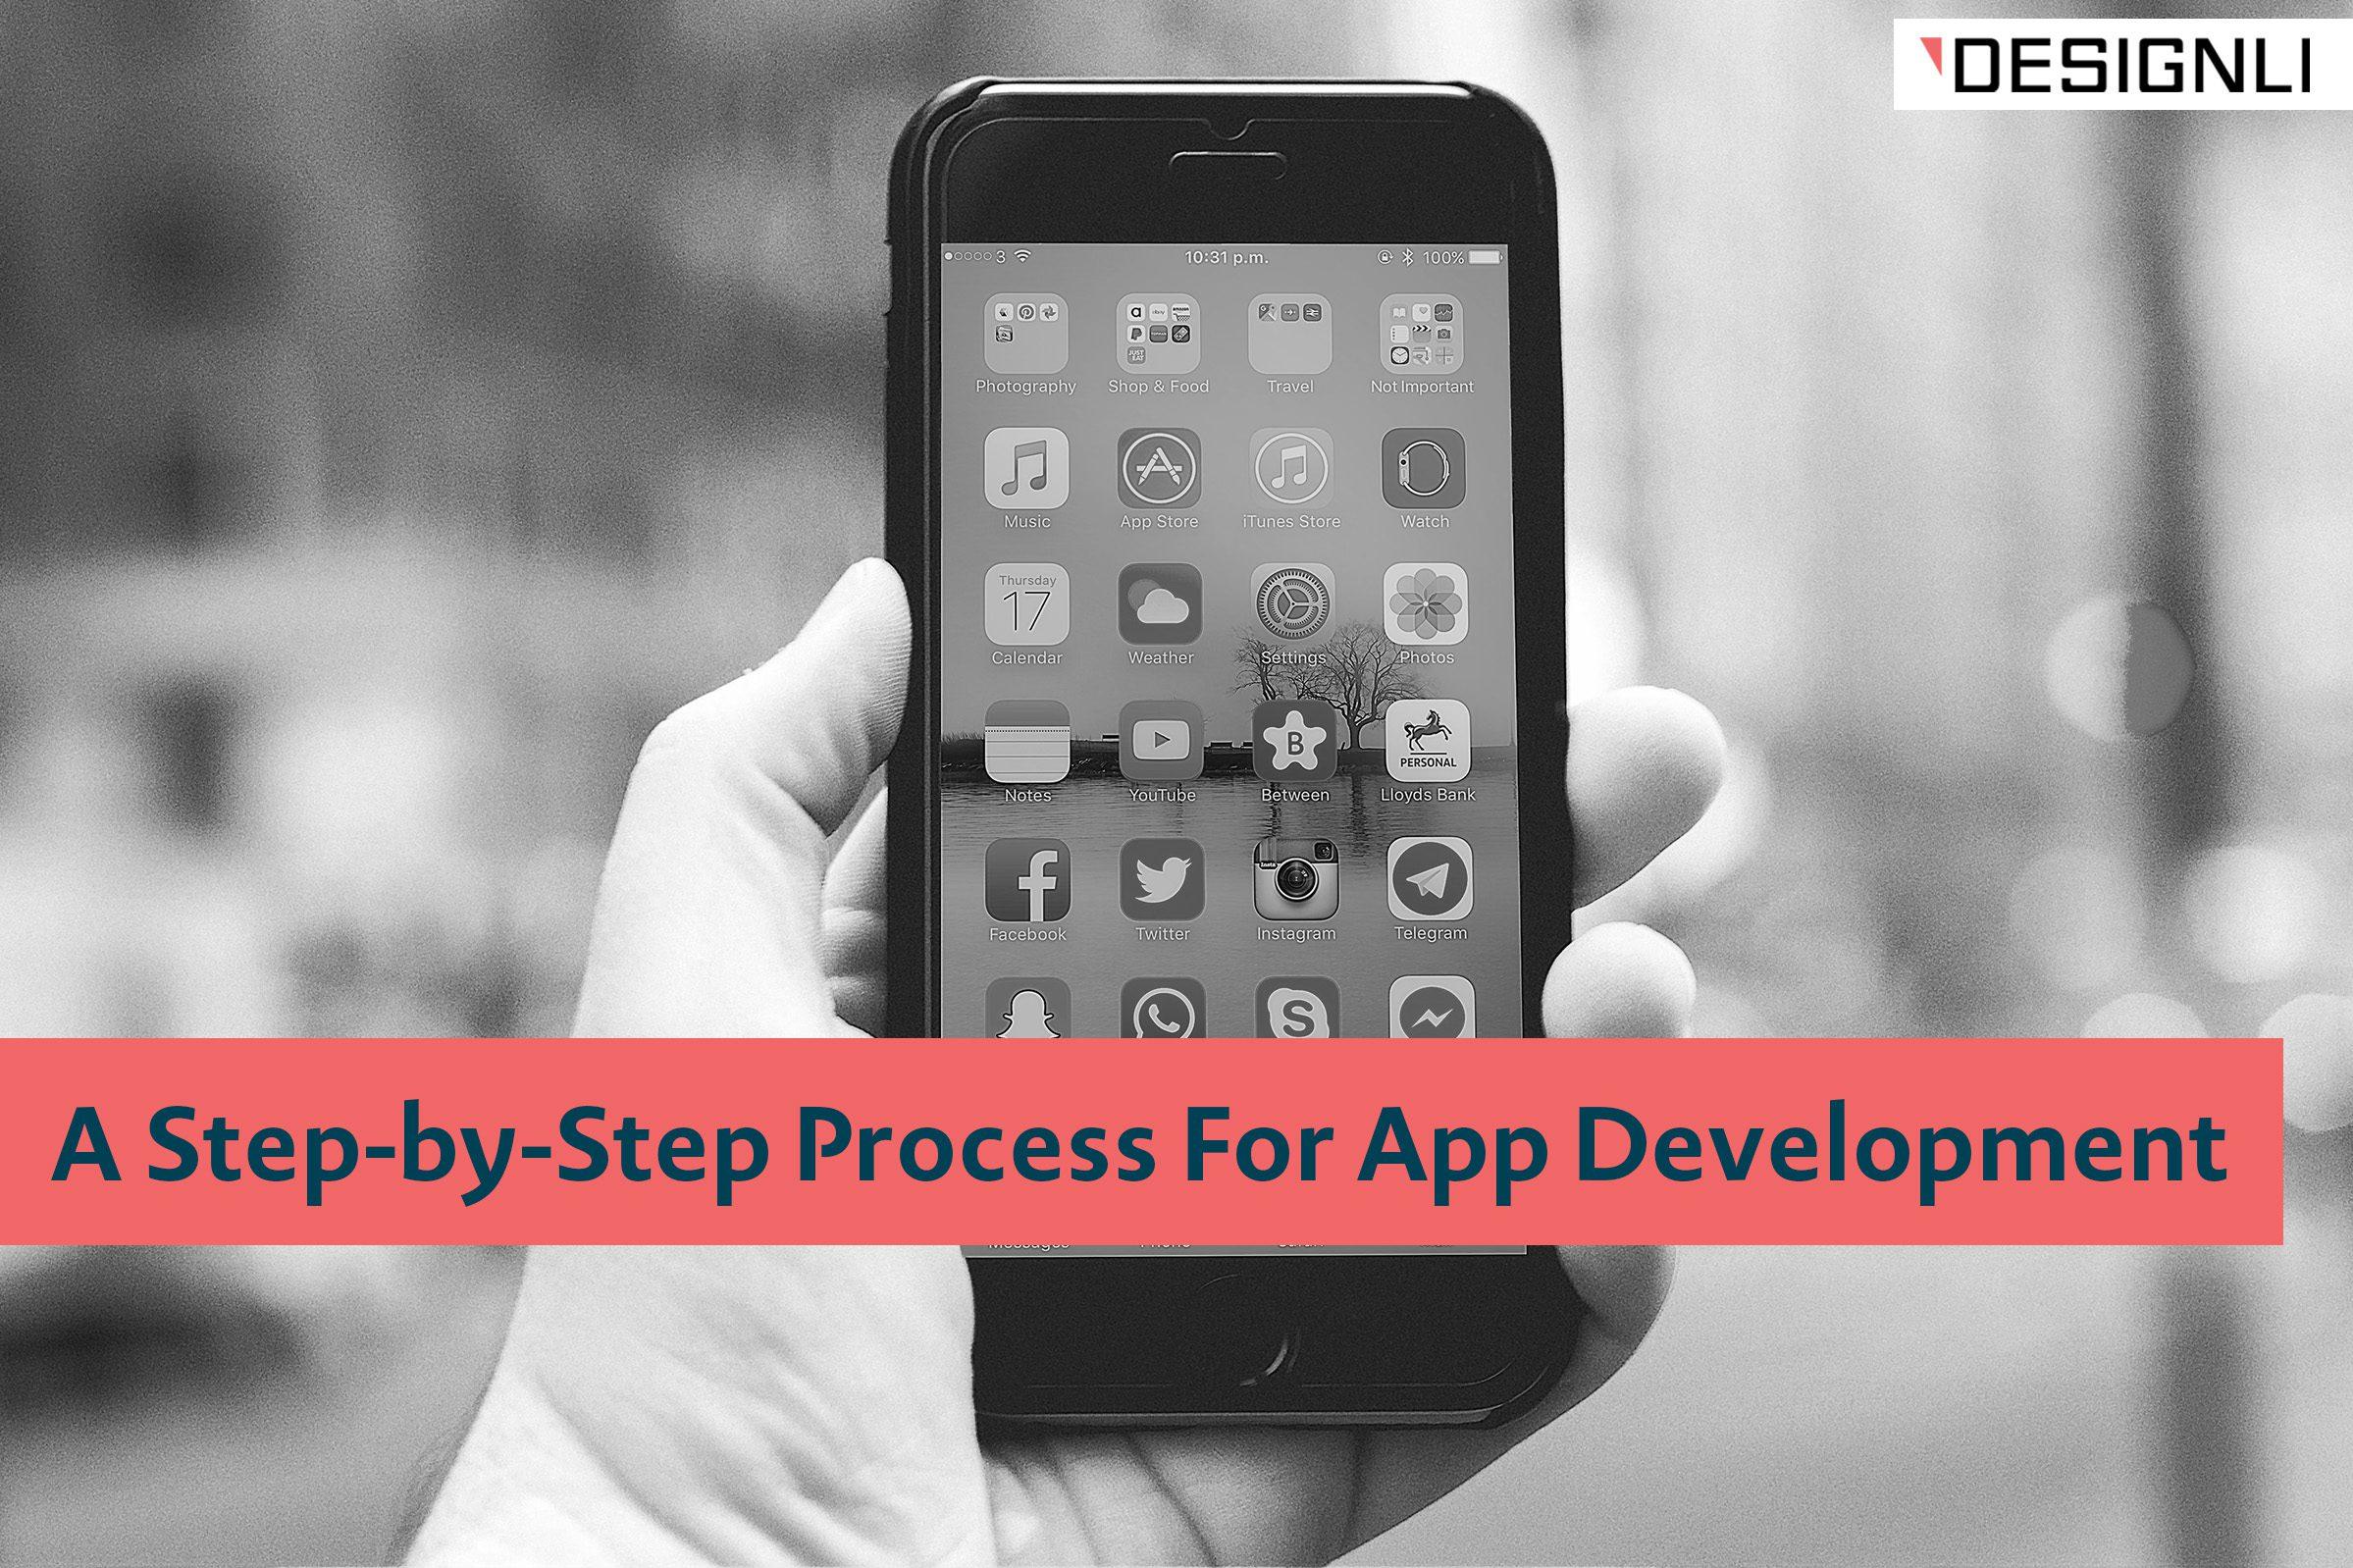 process for app development